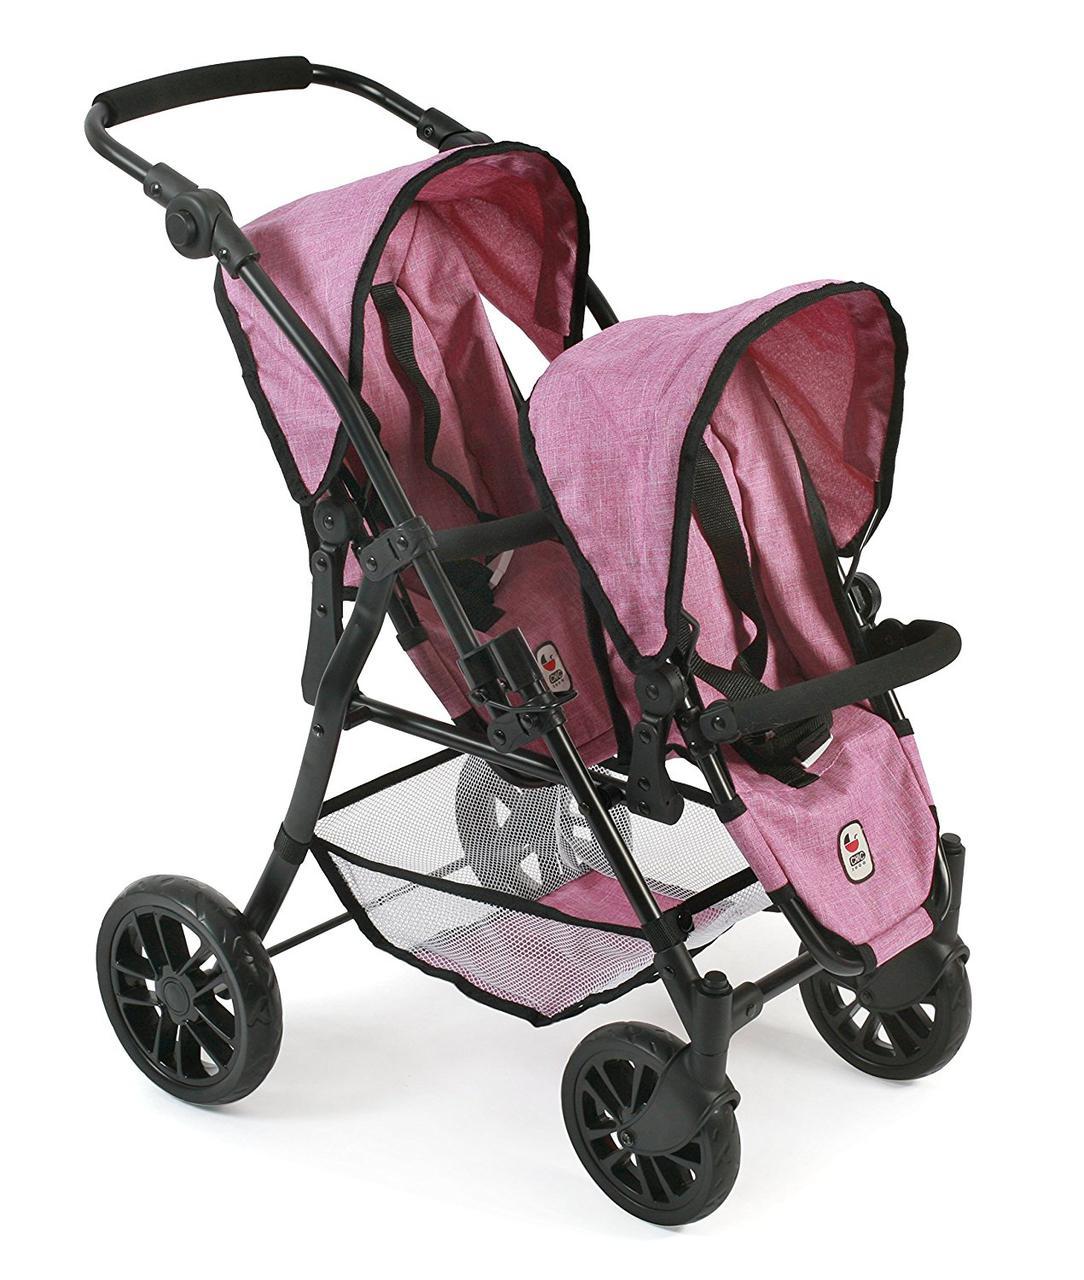 Коляска тандем для кукол для двойни розовая Байер Tandem Buggy Twinny Jeans Pink Bayer 69170